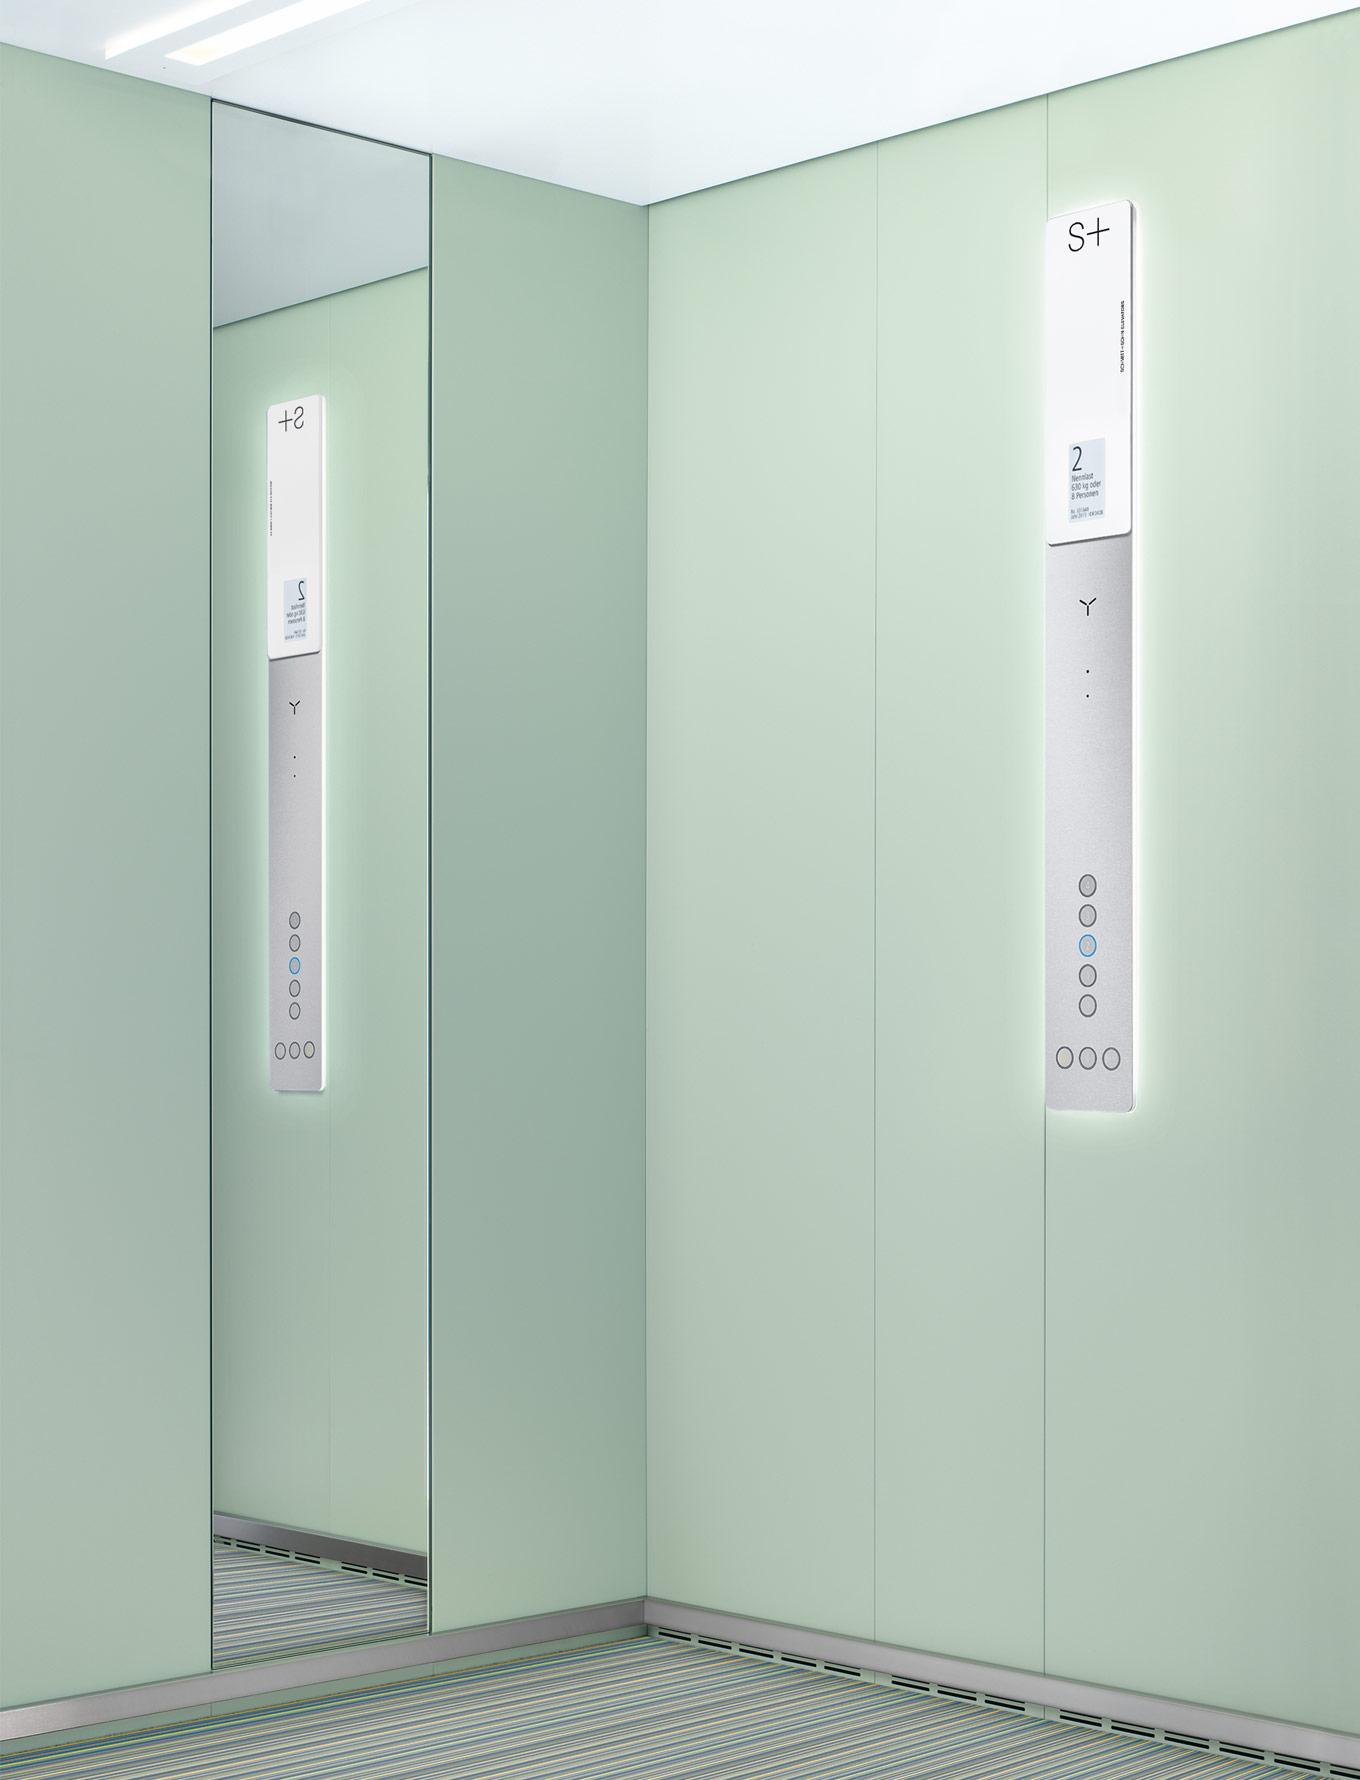 elevadores para pessoas schmitt sohn elevadores. Black Bedroom Furniture Sets. Home Design Ideas